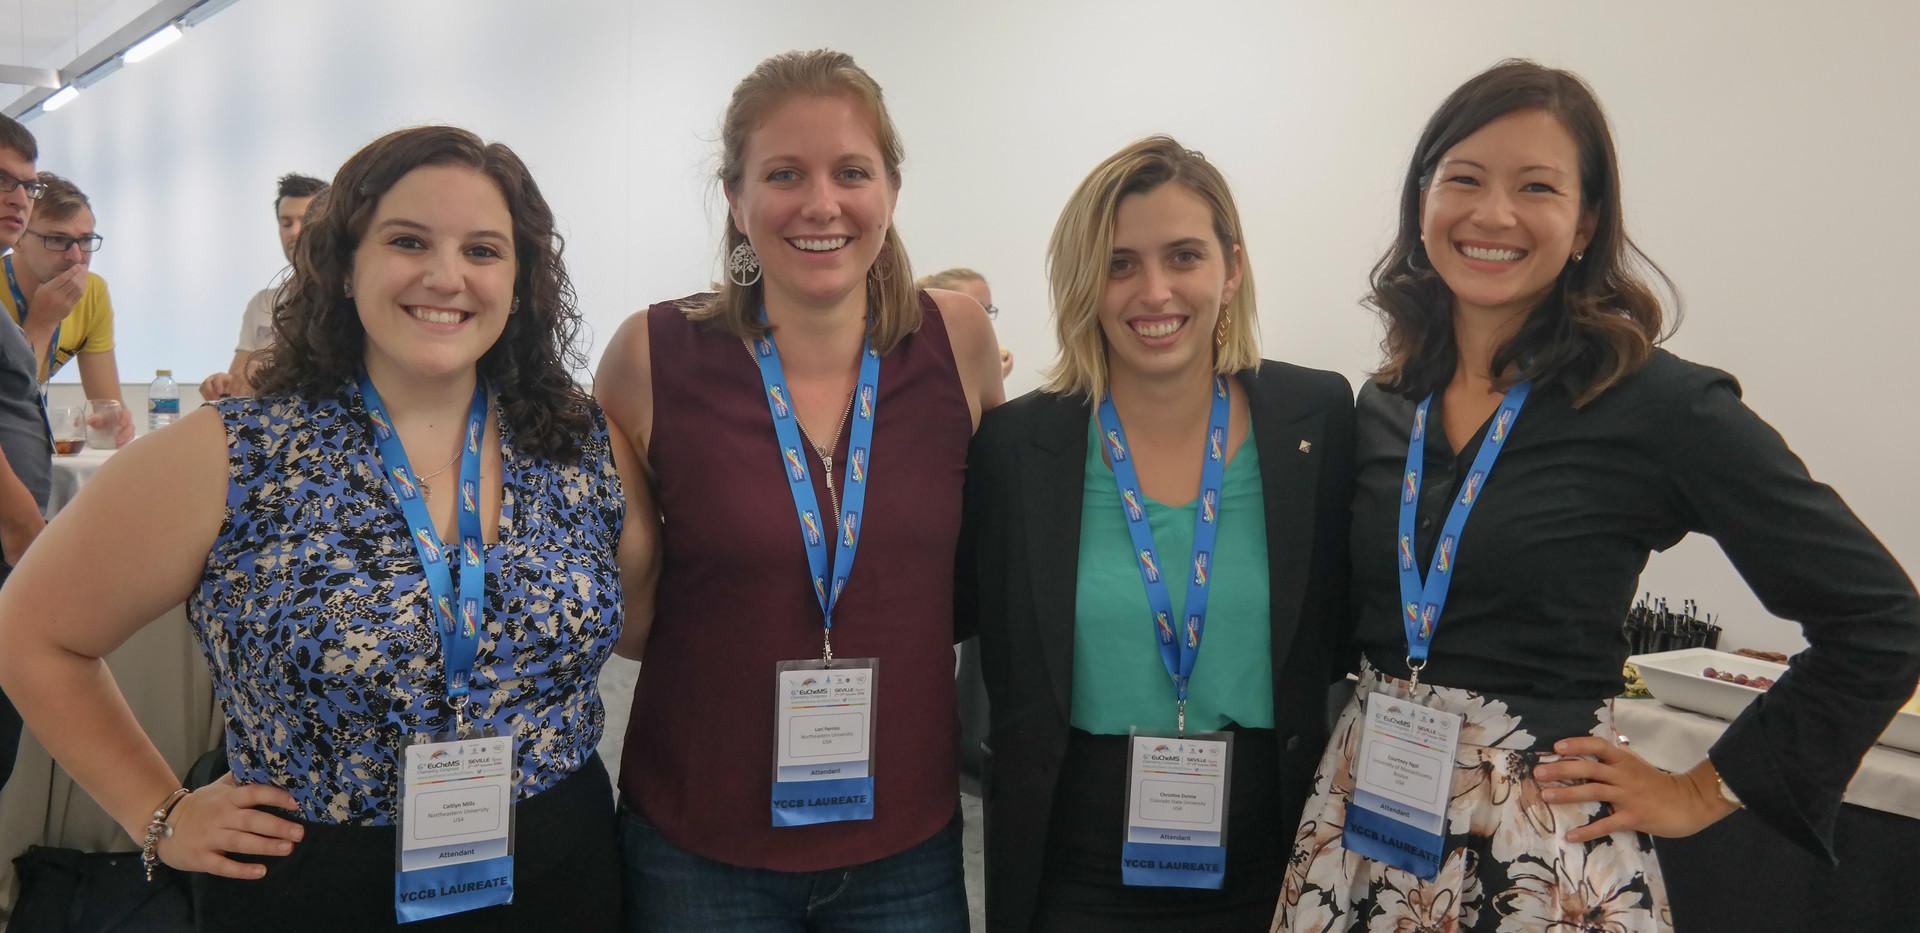 IYCN at EYCN Seville EuChems Conference, 2016